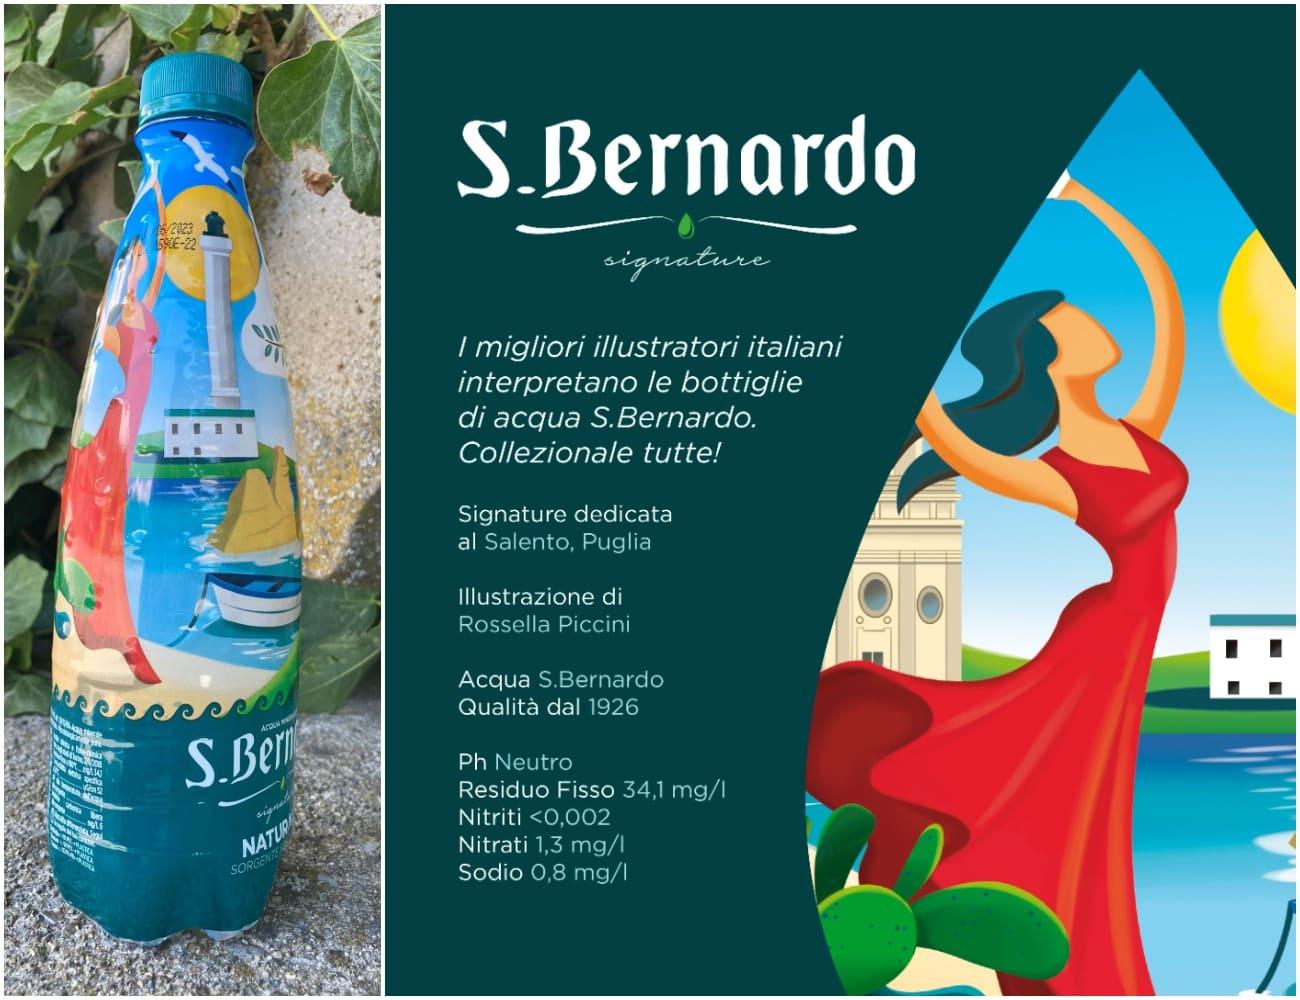 limited edition di Acqua S.Bernardo dedicata al Salento